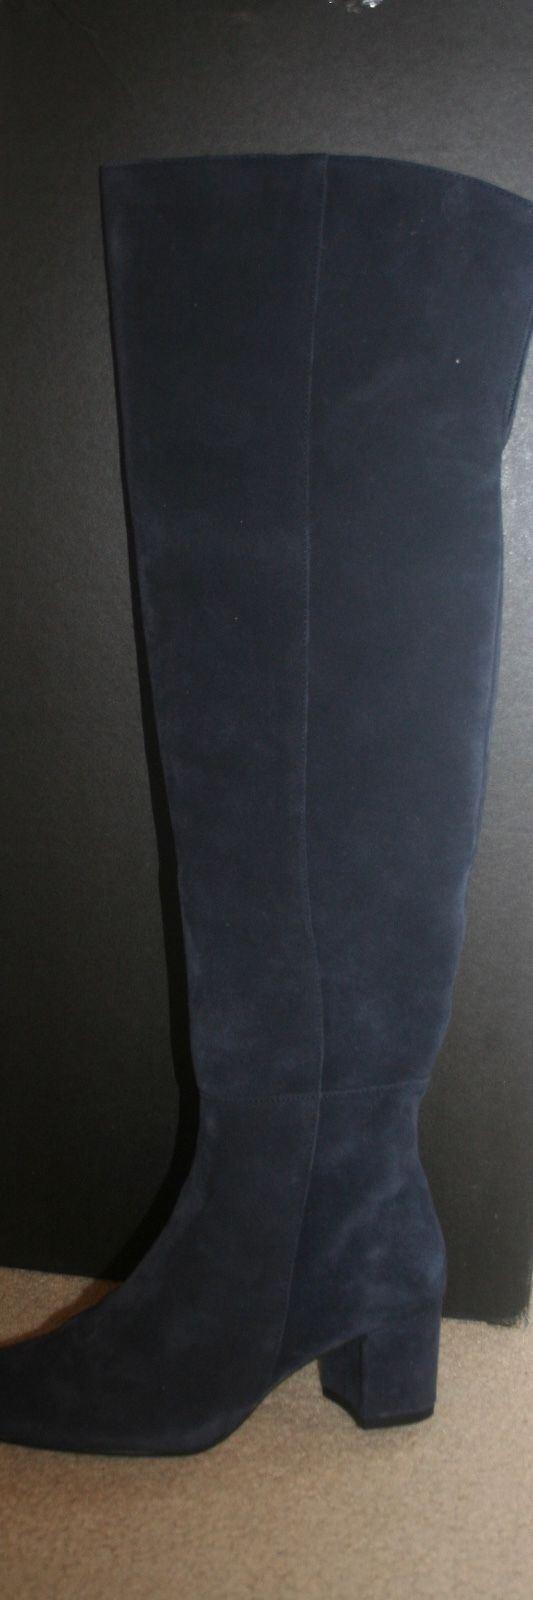 J.CREW 6M SUEDE OVER-THE-KNEE Stiefel SIZE 6M J.CREW DARK PACIFIC F8009 e20716